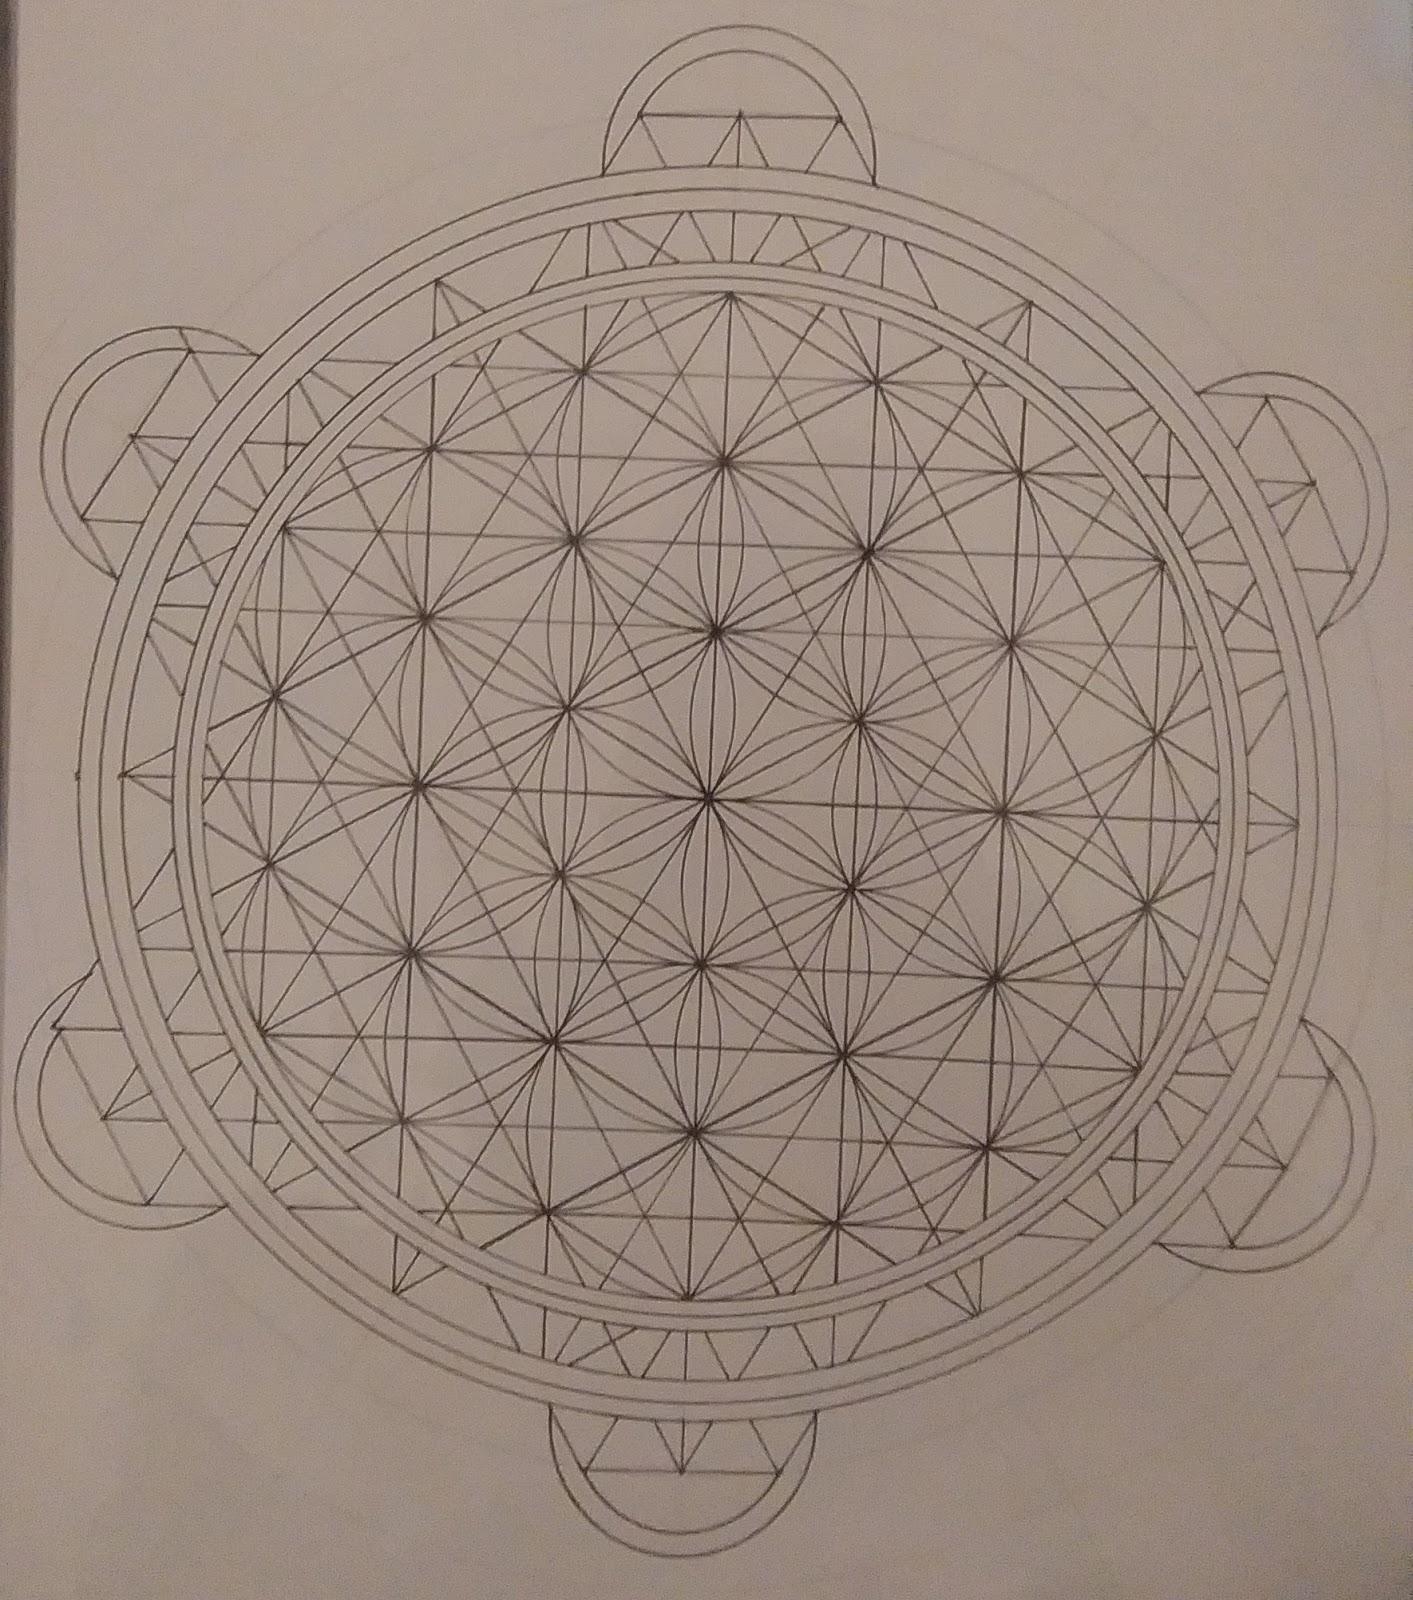 [SPOLYK] - Geometries & sketches - Page 6 47682544_1103195663200450_5895631410273714176_o